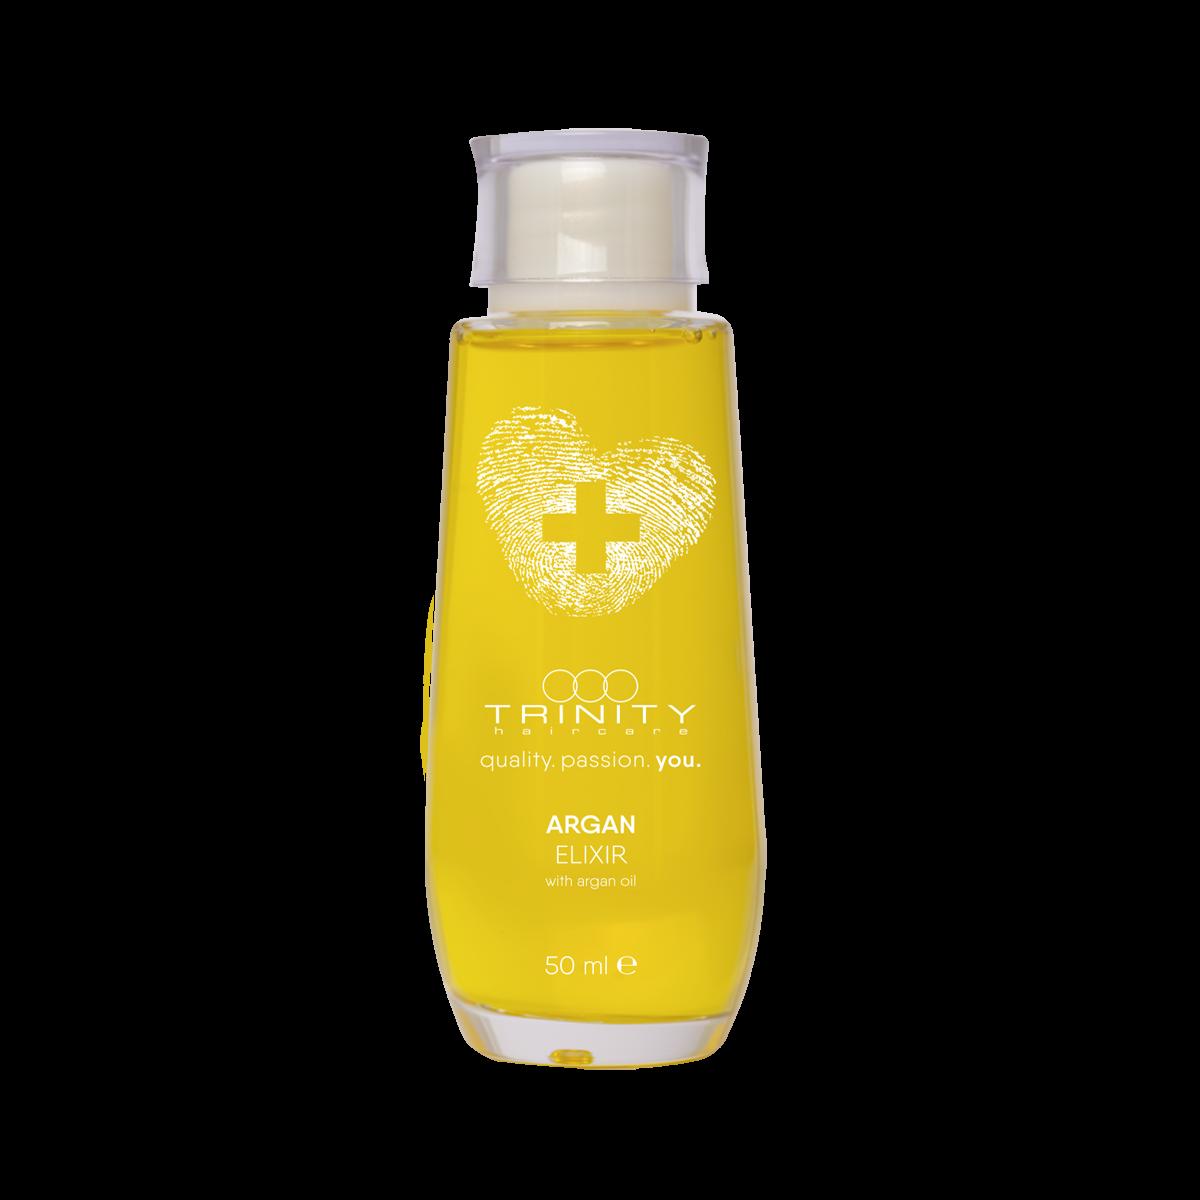 Trinity Hair Care Эликсир Therapies Argan Oil Elixir Аргановый, 50 мл эликсир для волос beauty elixir for your hair эликсир 50мл